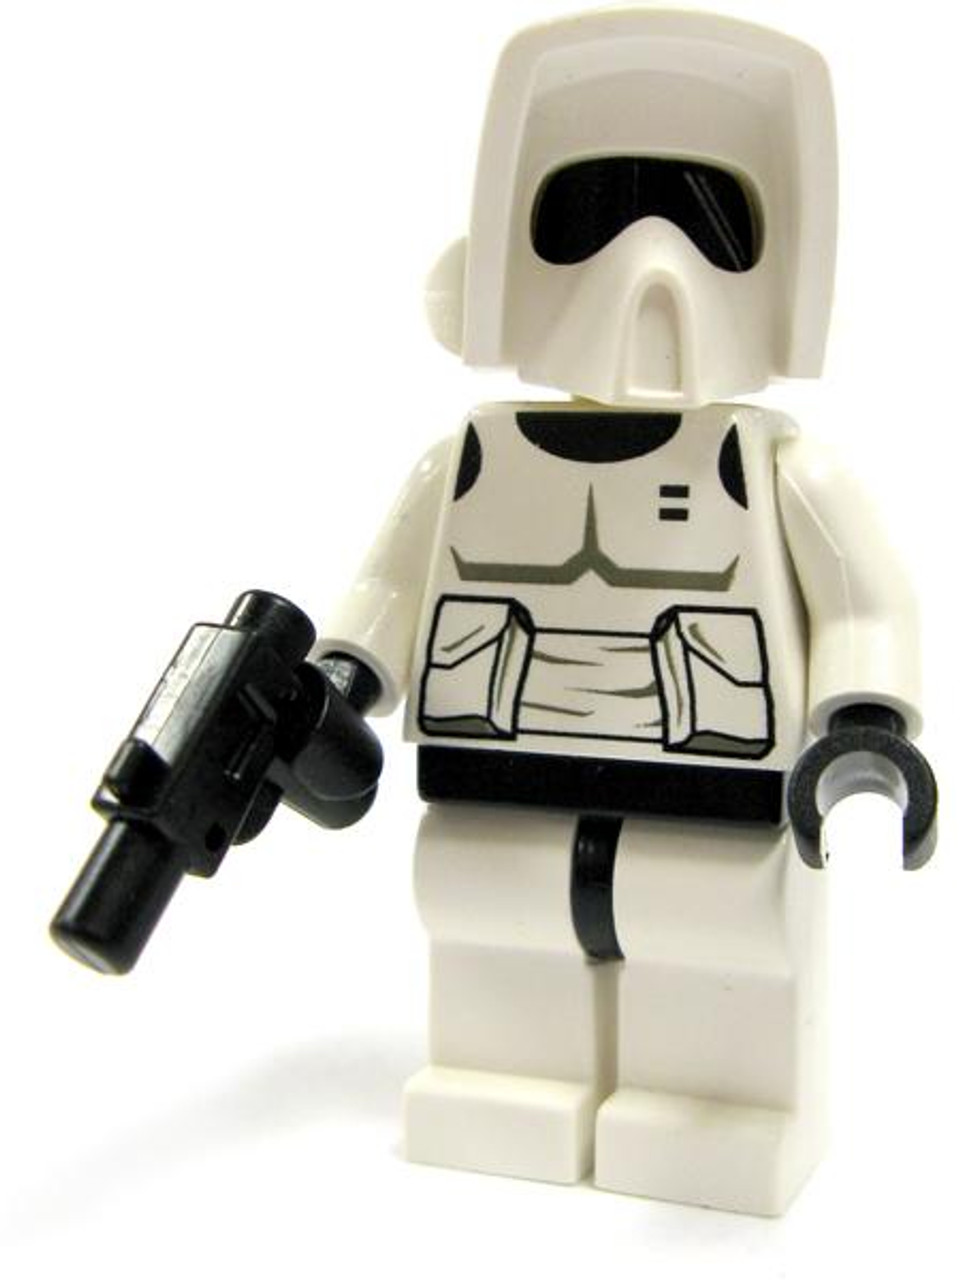 LEGO Star Wars Loose Scout Trooper Minifigure [Version 1 Loose]